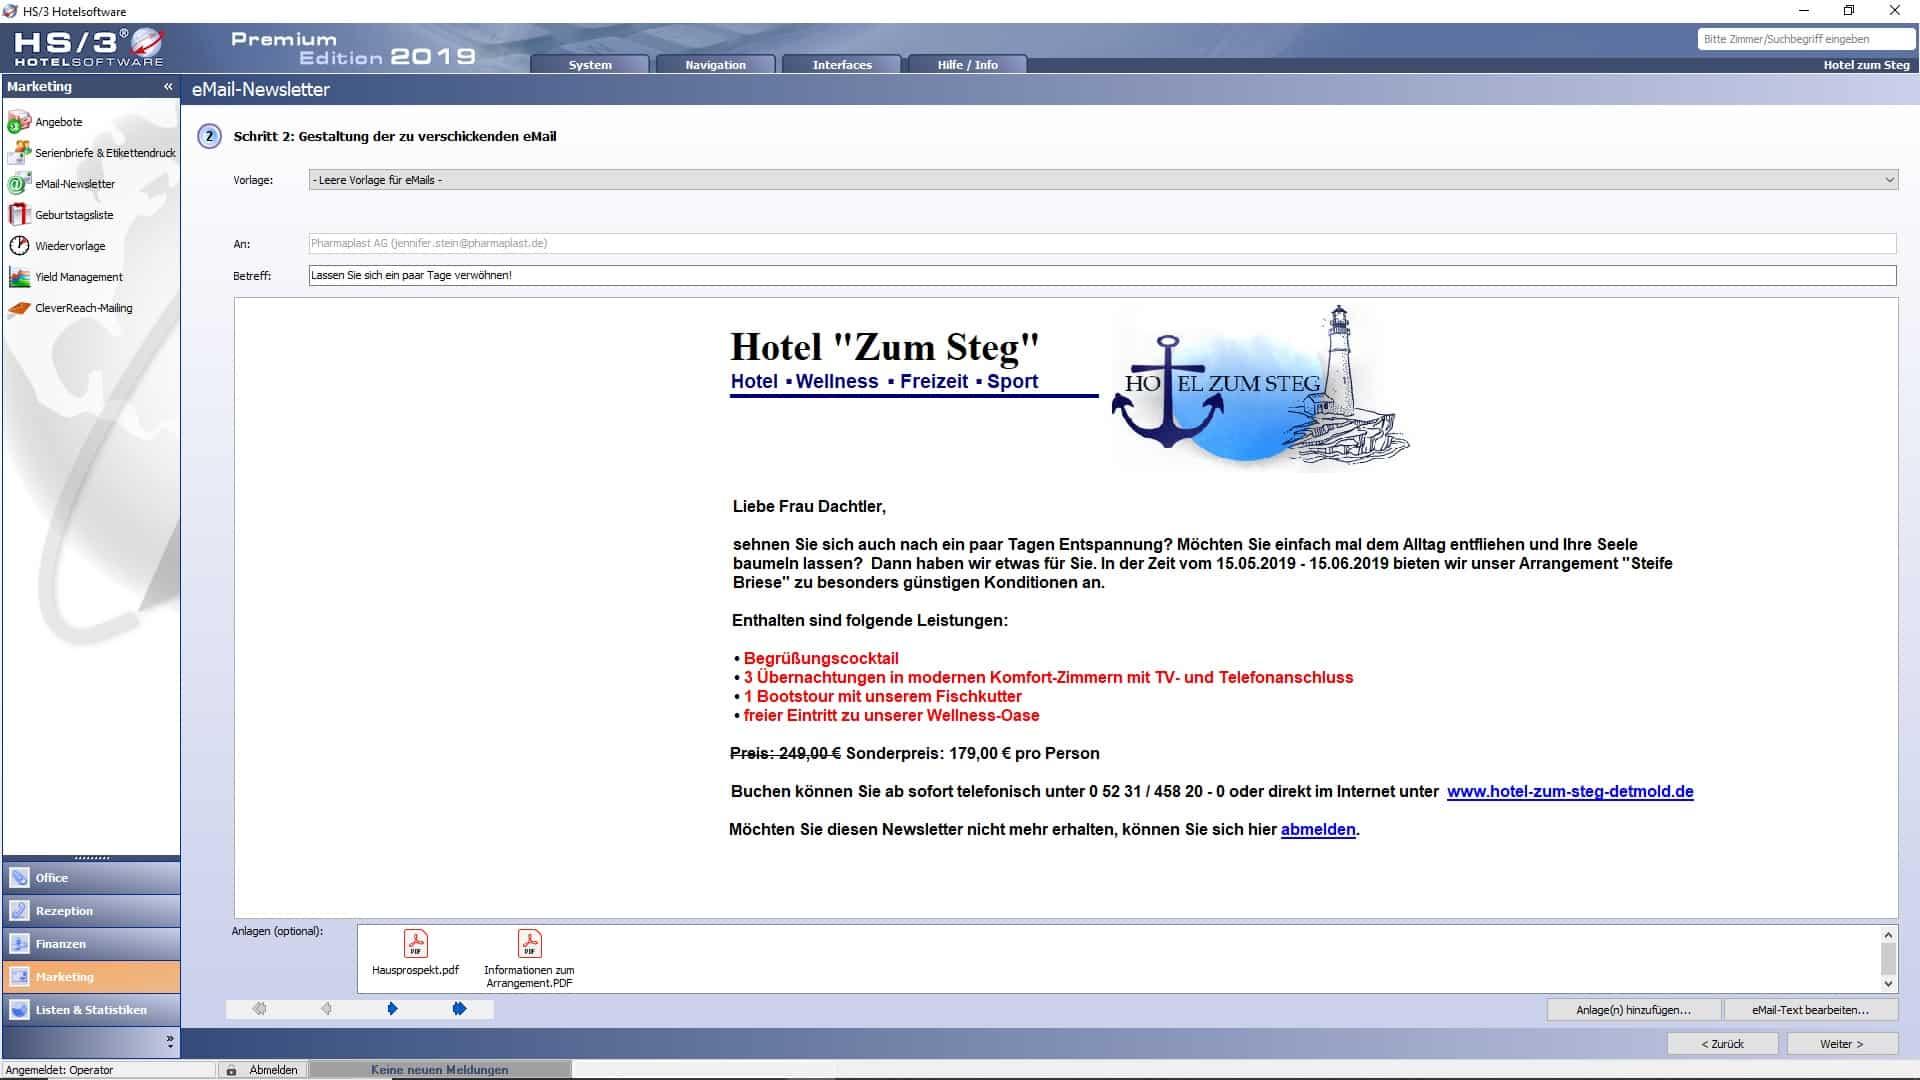 Geburtstagsliste marketing - hs/3 hotelsoftware